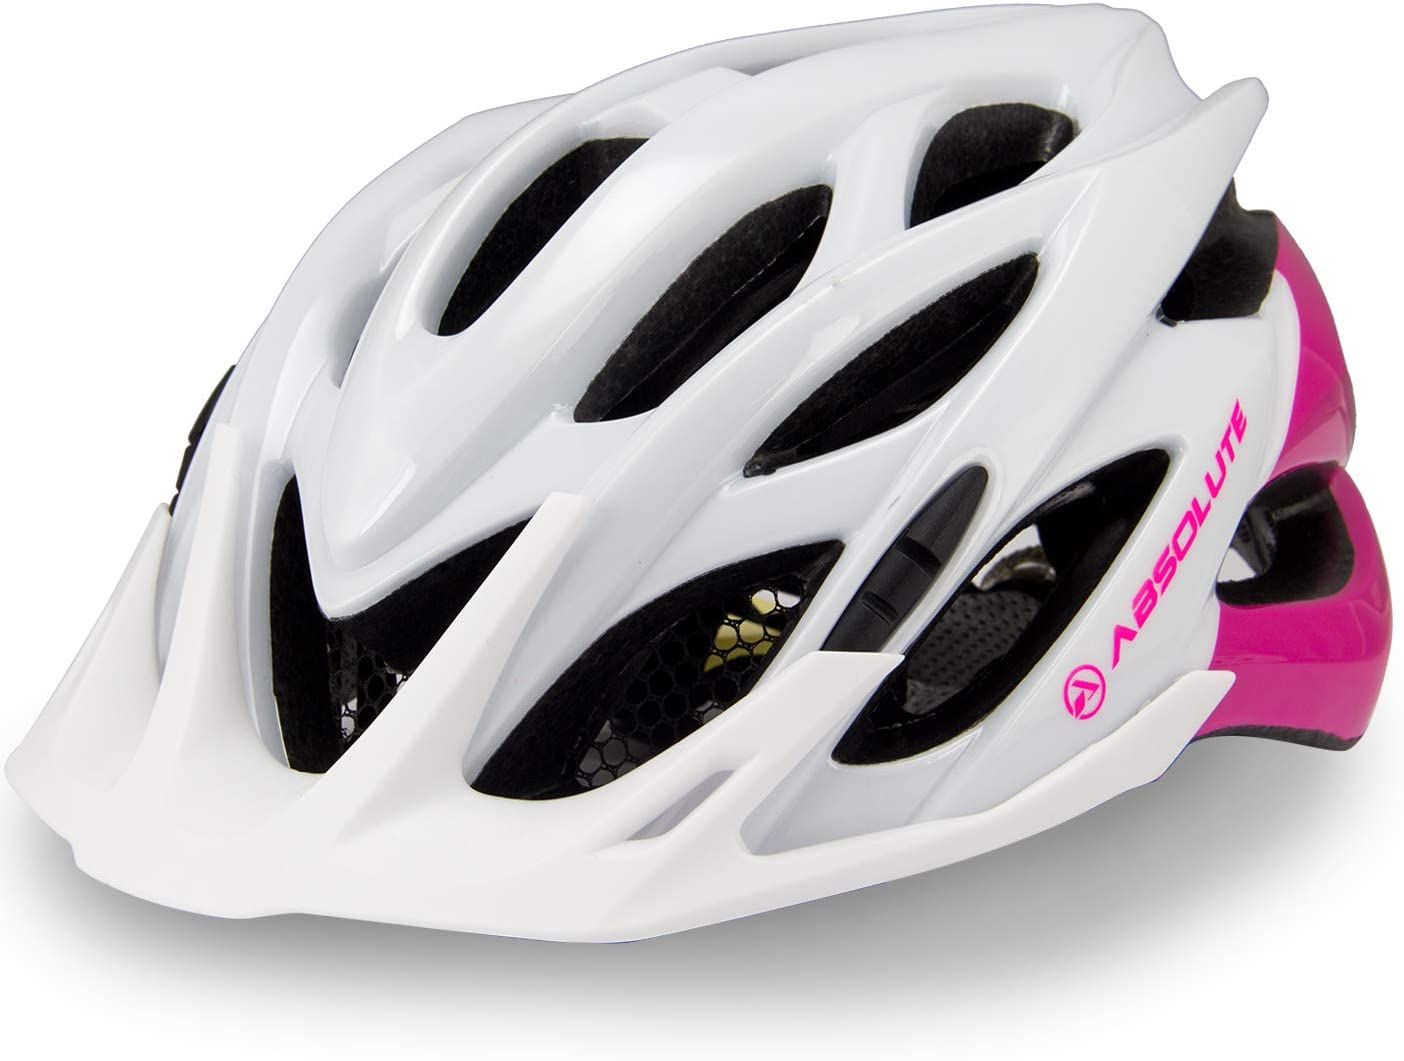 Capacete Ciclismo Bike Feminino Absolute Wild Mia Led Pisca